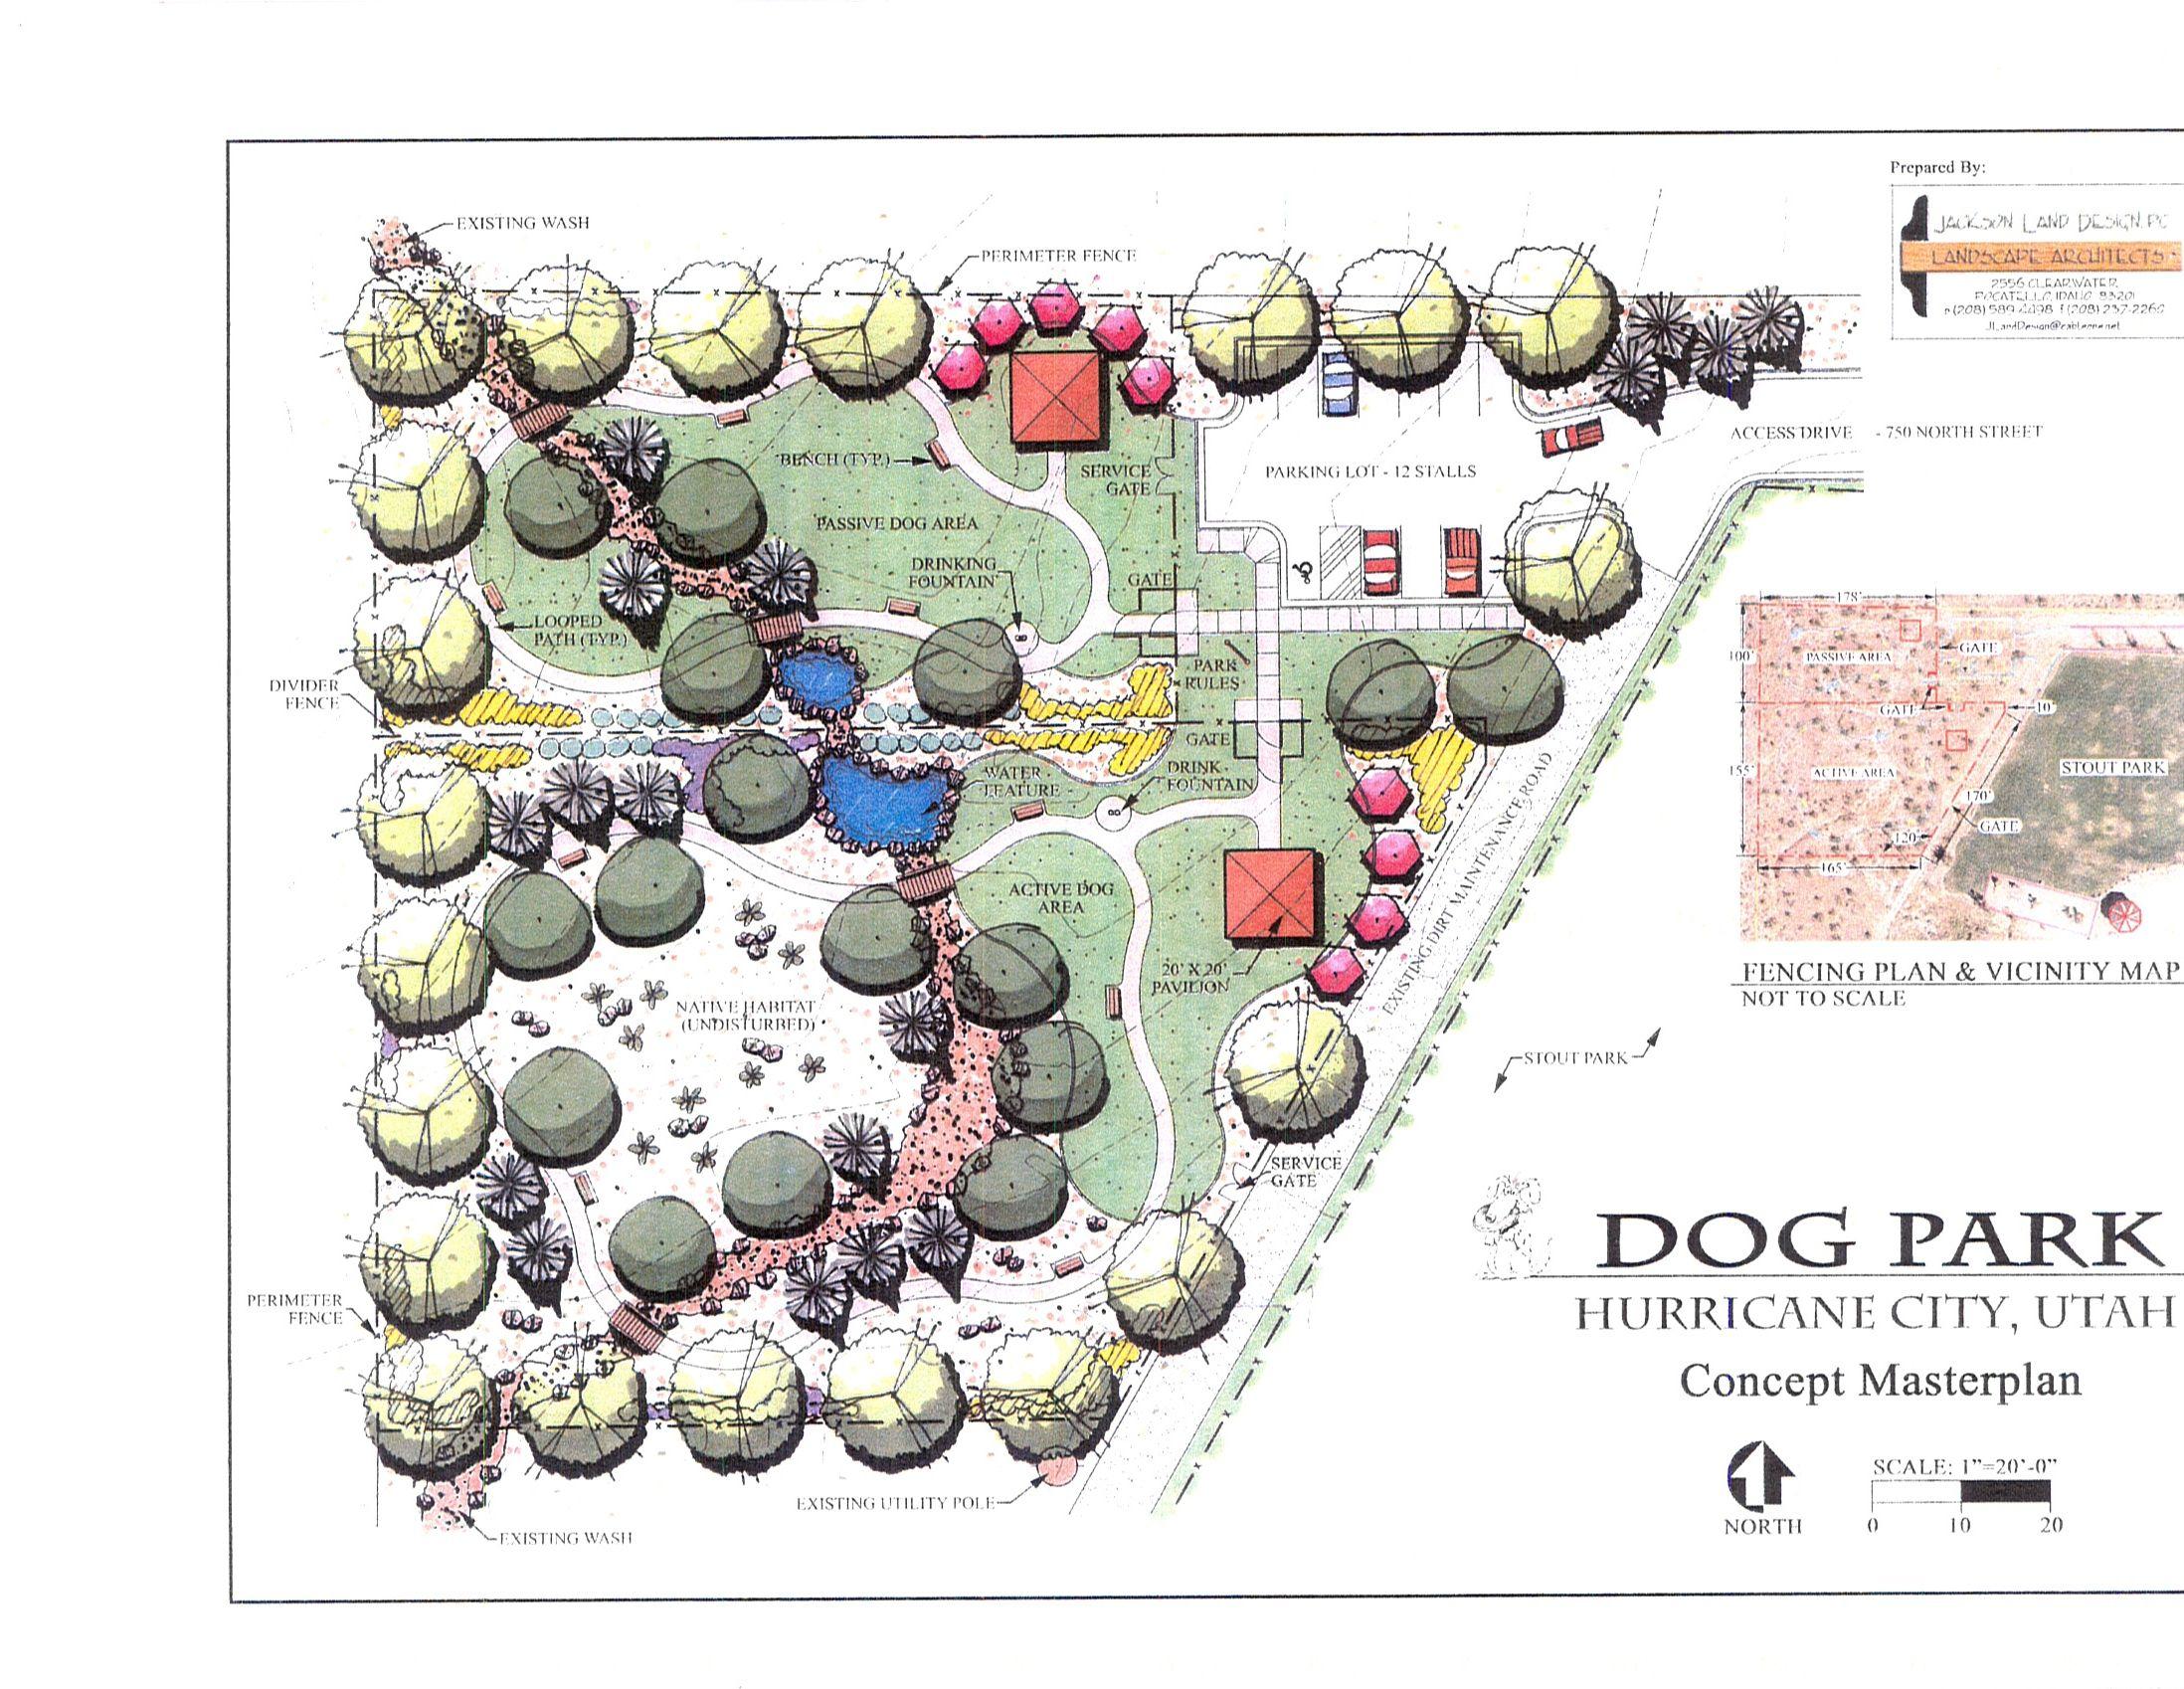 Dog Park Plans Jpg 2196 1698 Dog Park Dogs Park